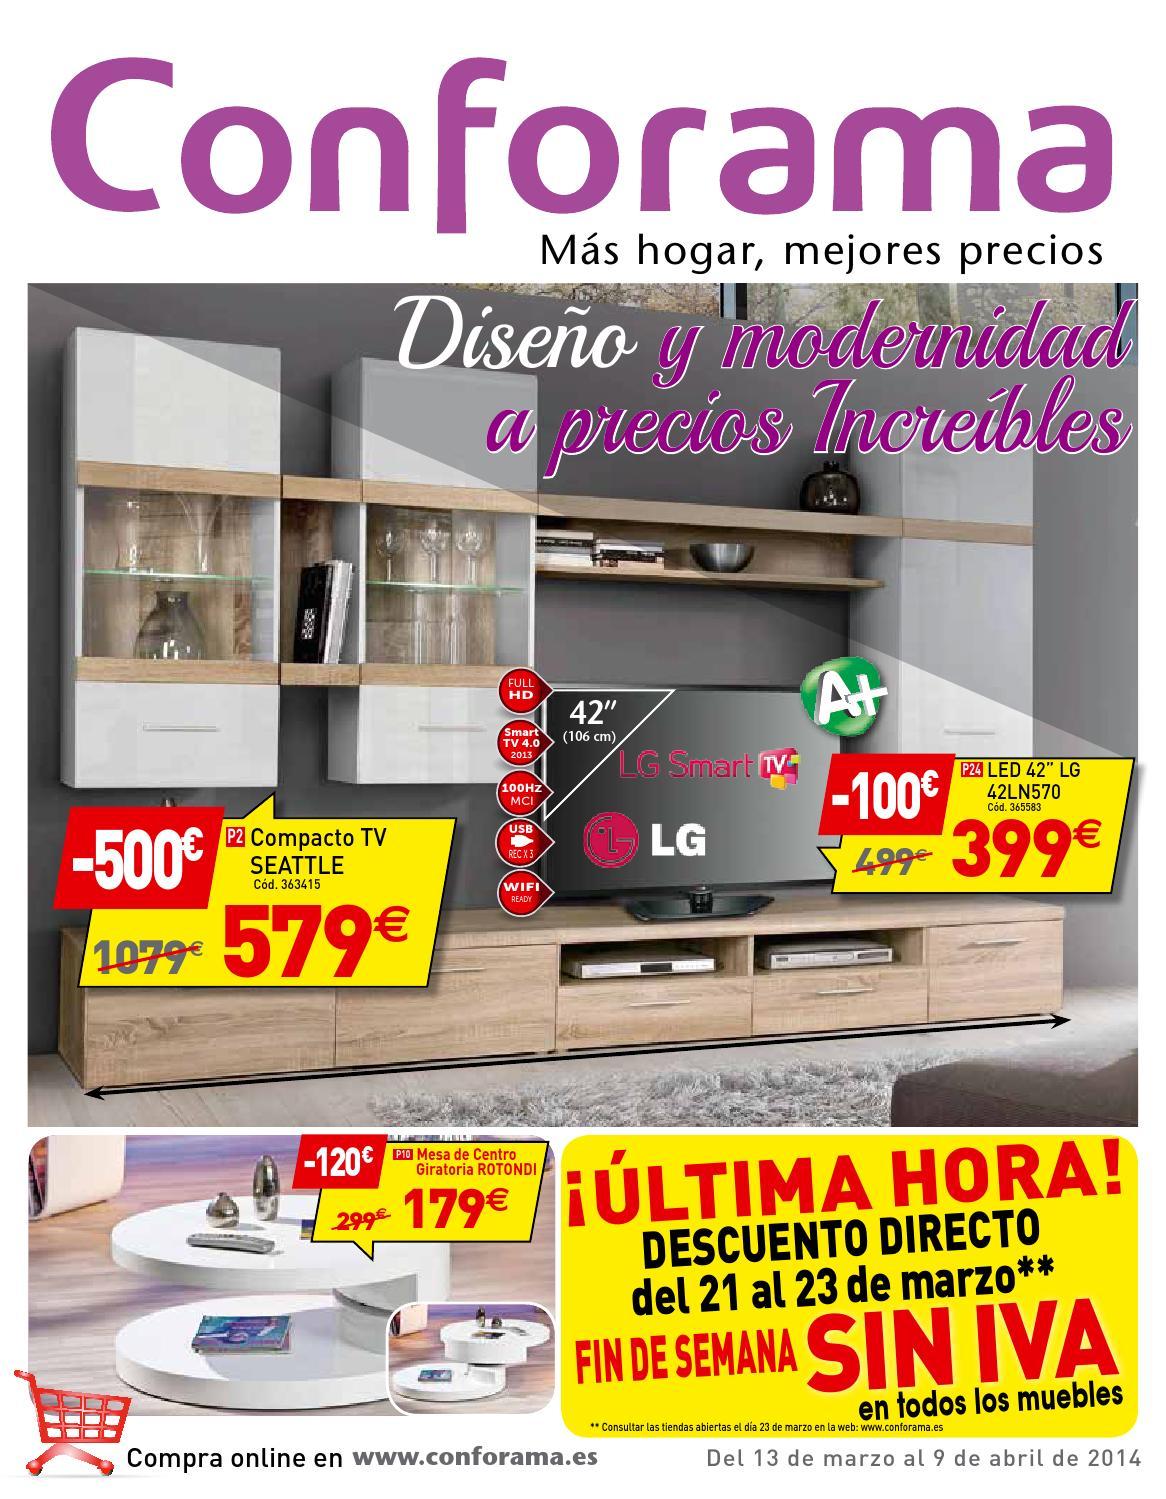 Conforama by losdescuentos - issuu